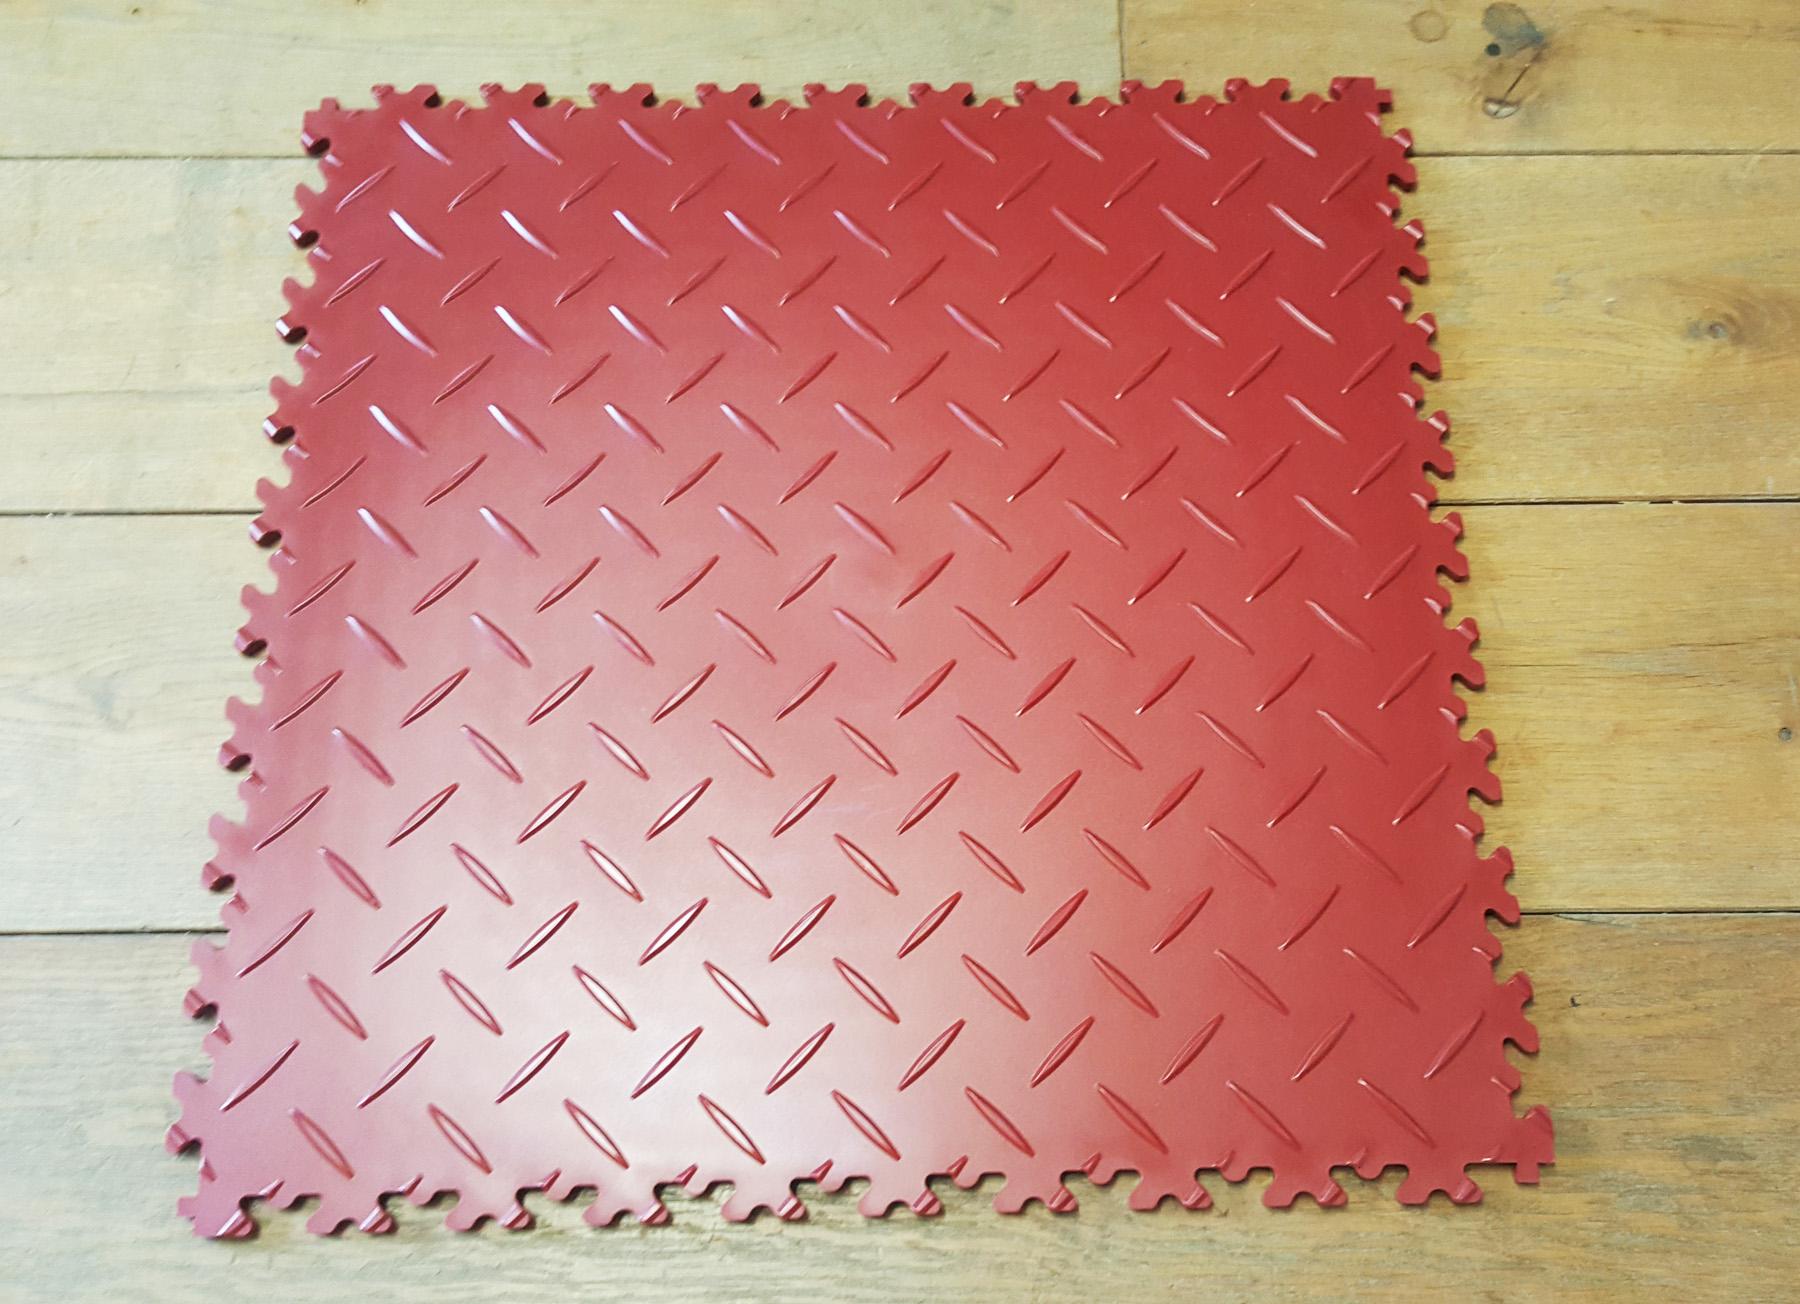 premium pvc 510 x 510 x 7mm werkstatt fliese diamond farbe. Black Bedroom Furniture Sets. Home Design Ideas